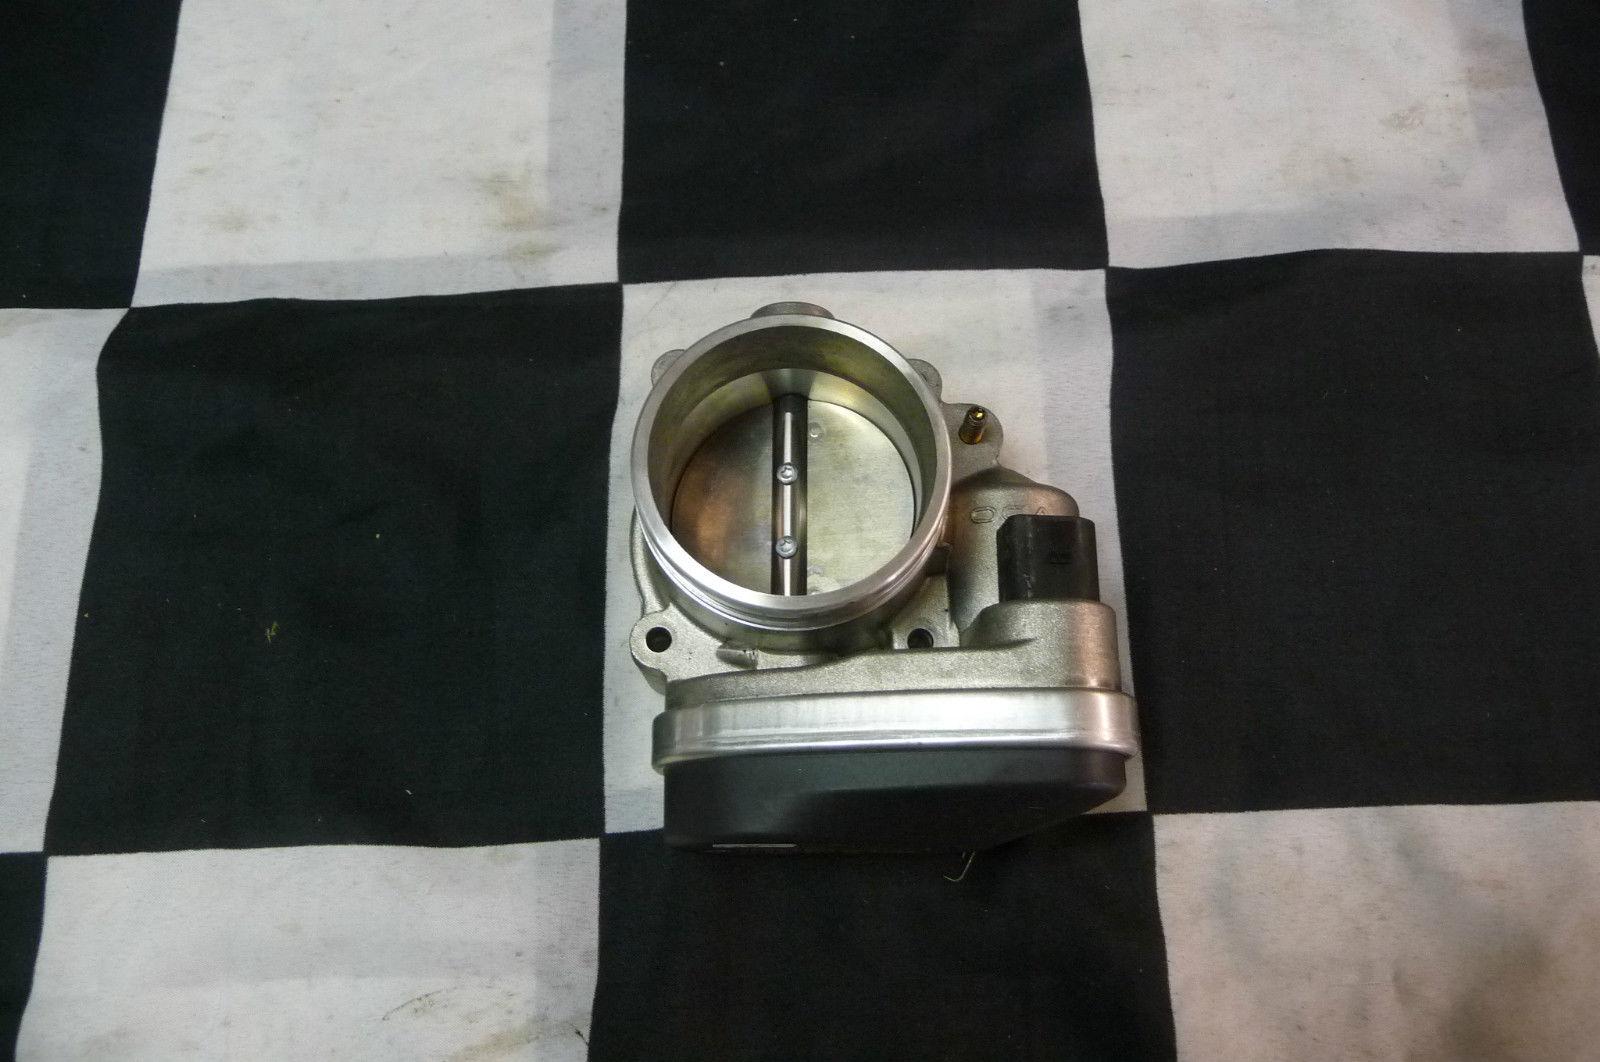 BMW 3 5 Series X3 Z3 Z4 Fuel Injection System Throttle Assy Housing 13547502444